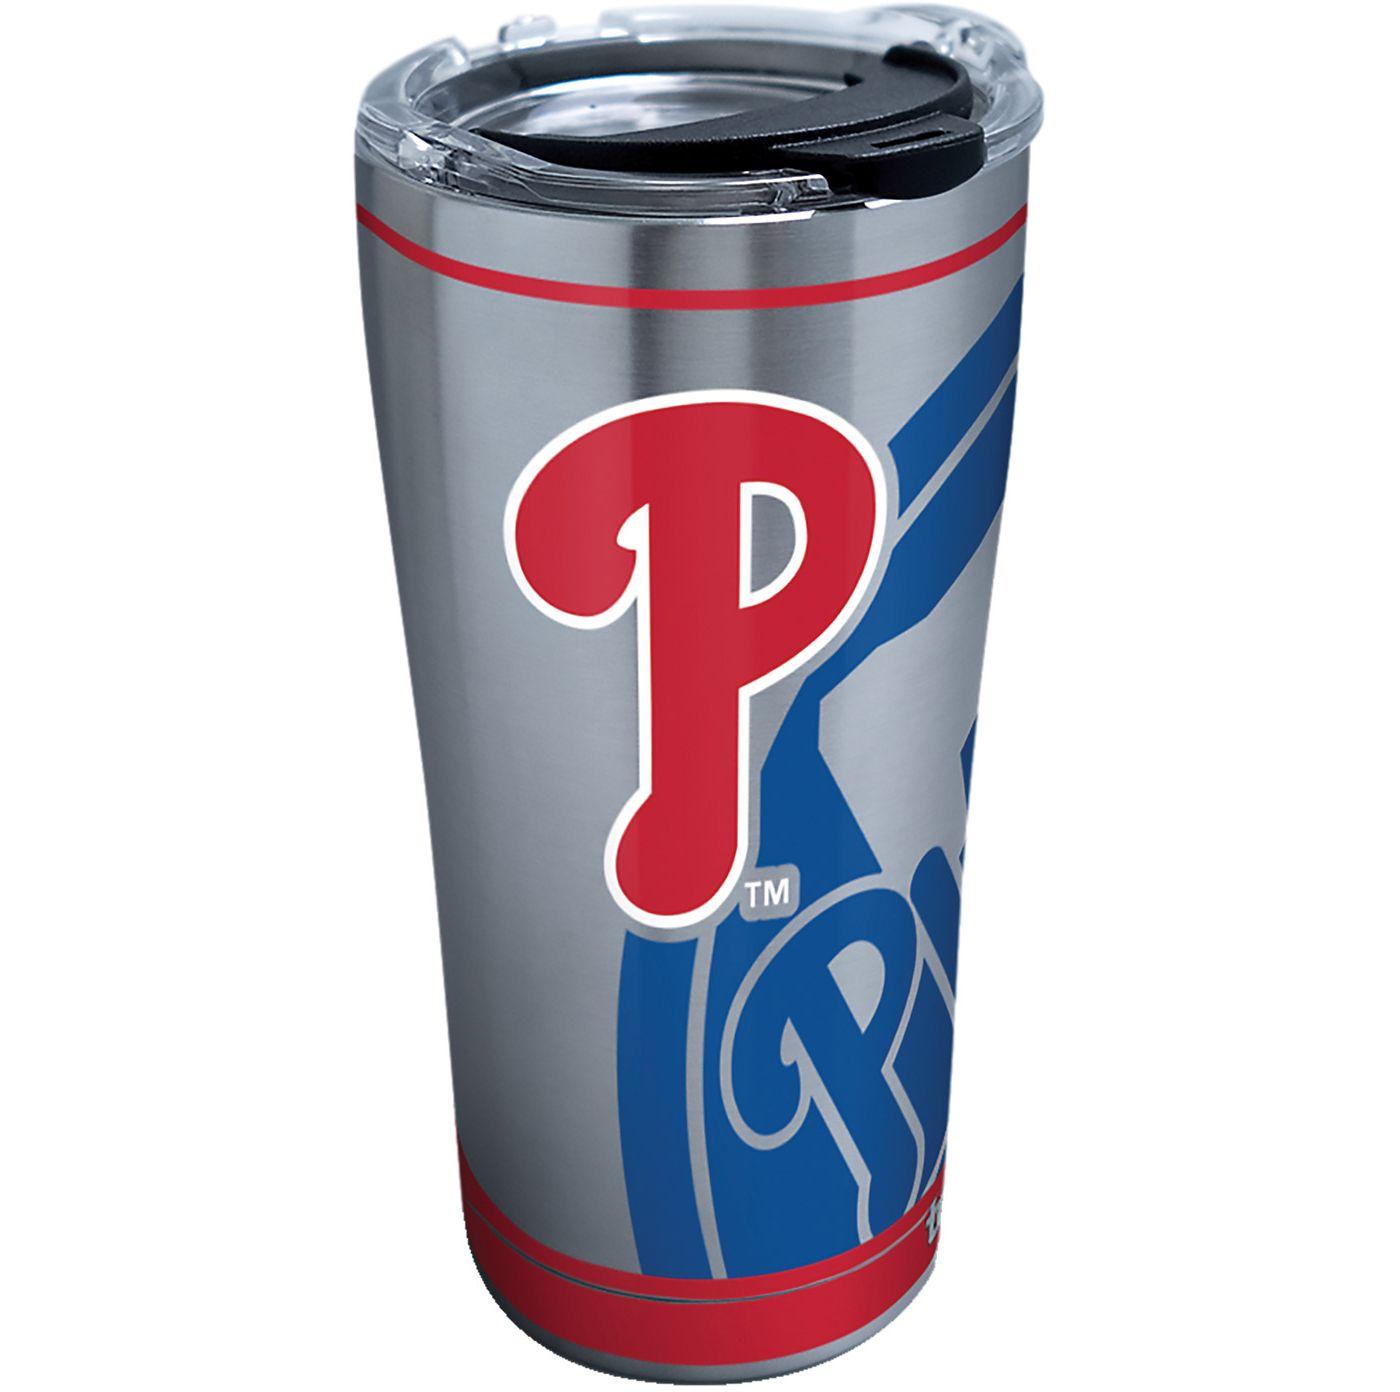 Tervis Philadelphia Phillies 20oz. Stainless Steel Tumbler